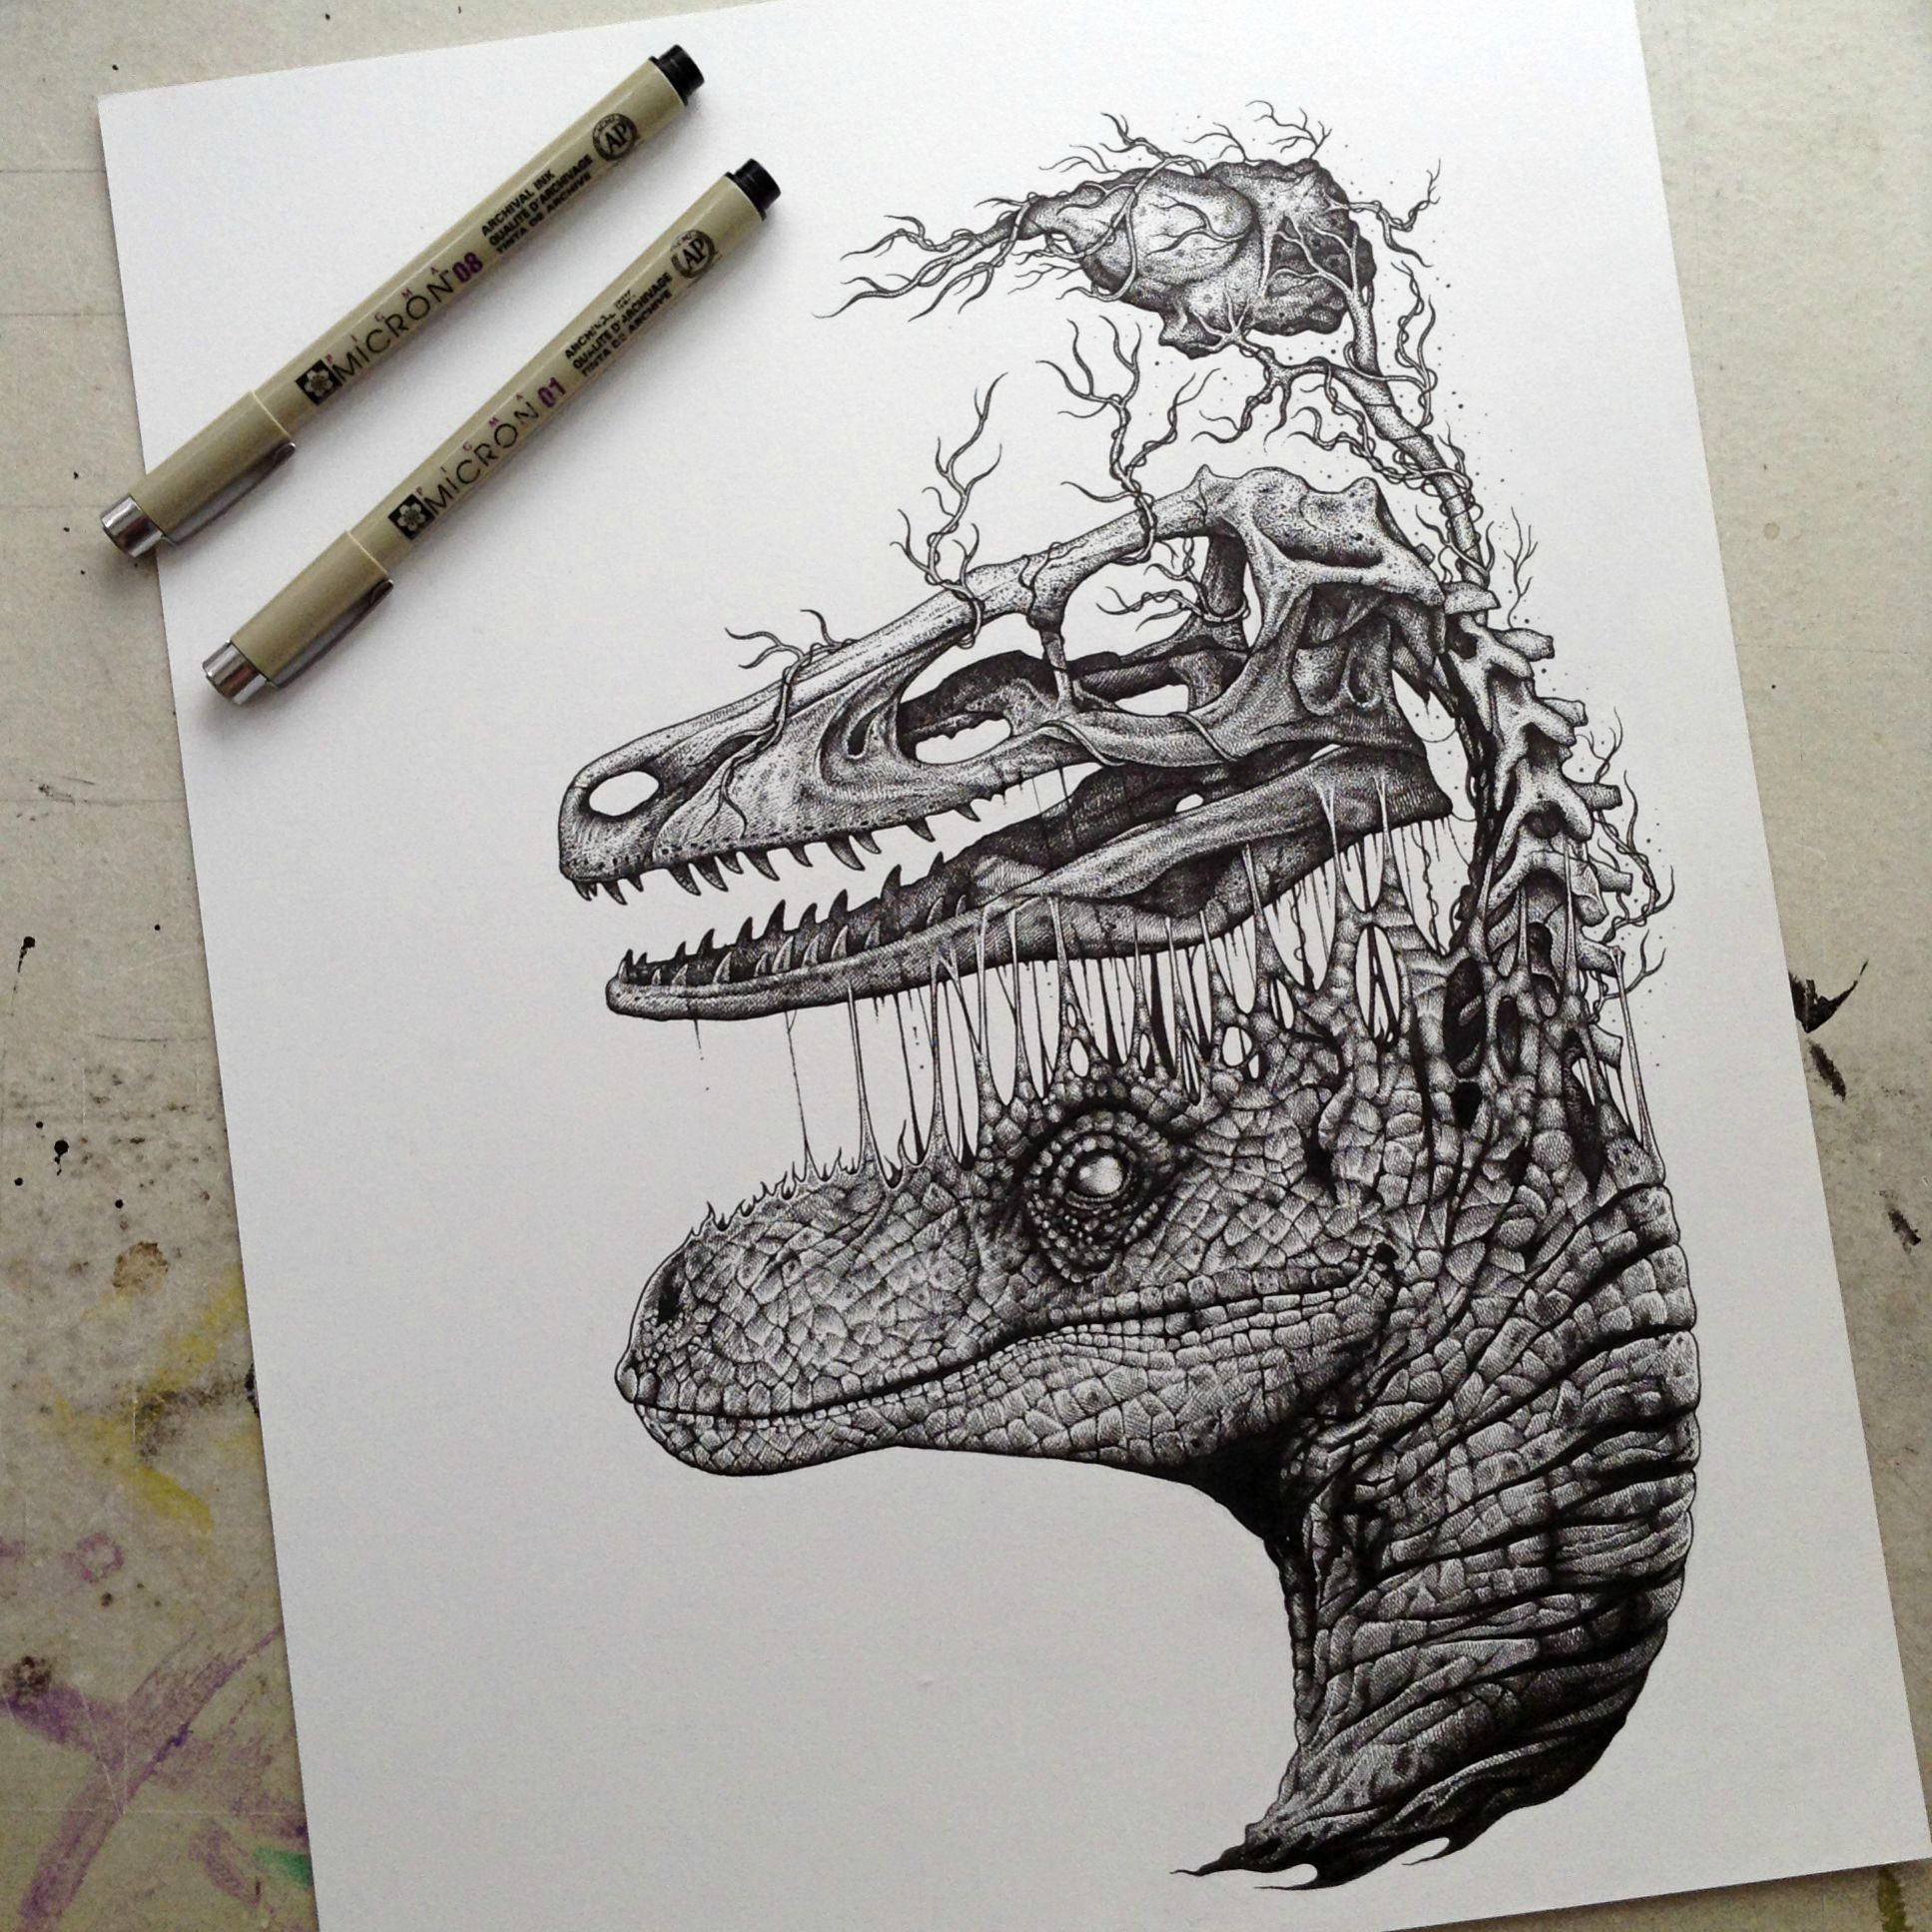 1935x1935 Raptor Skull And Brain Drawing